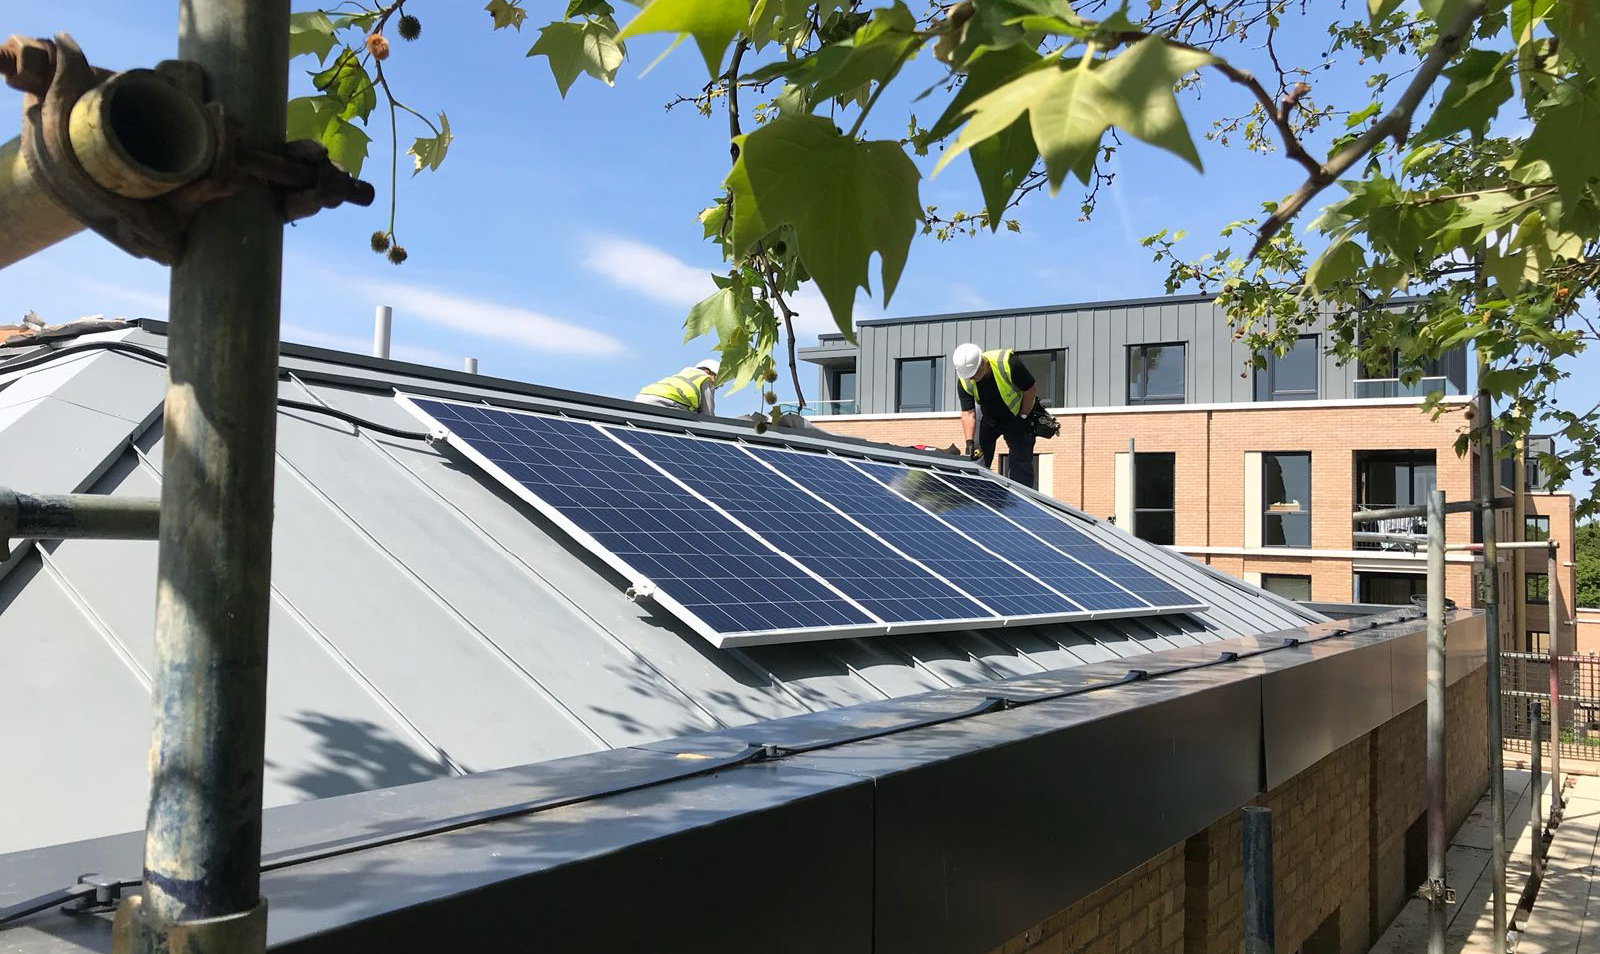 Solar panel building regs